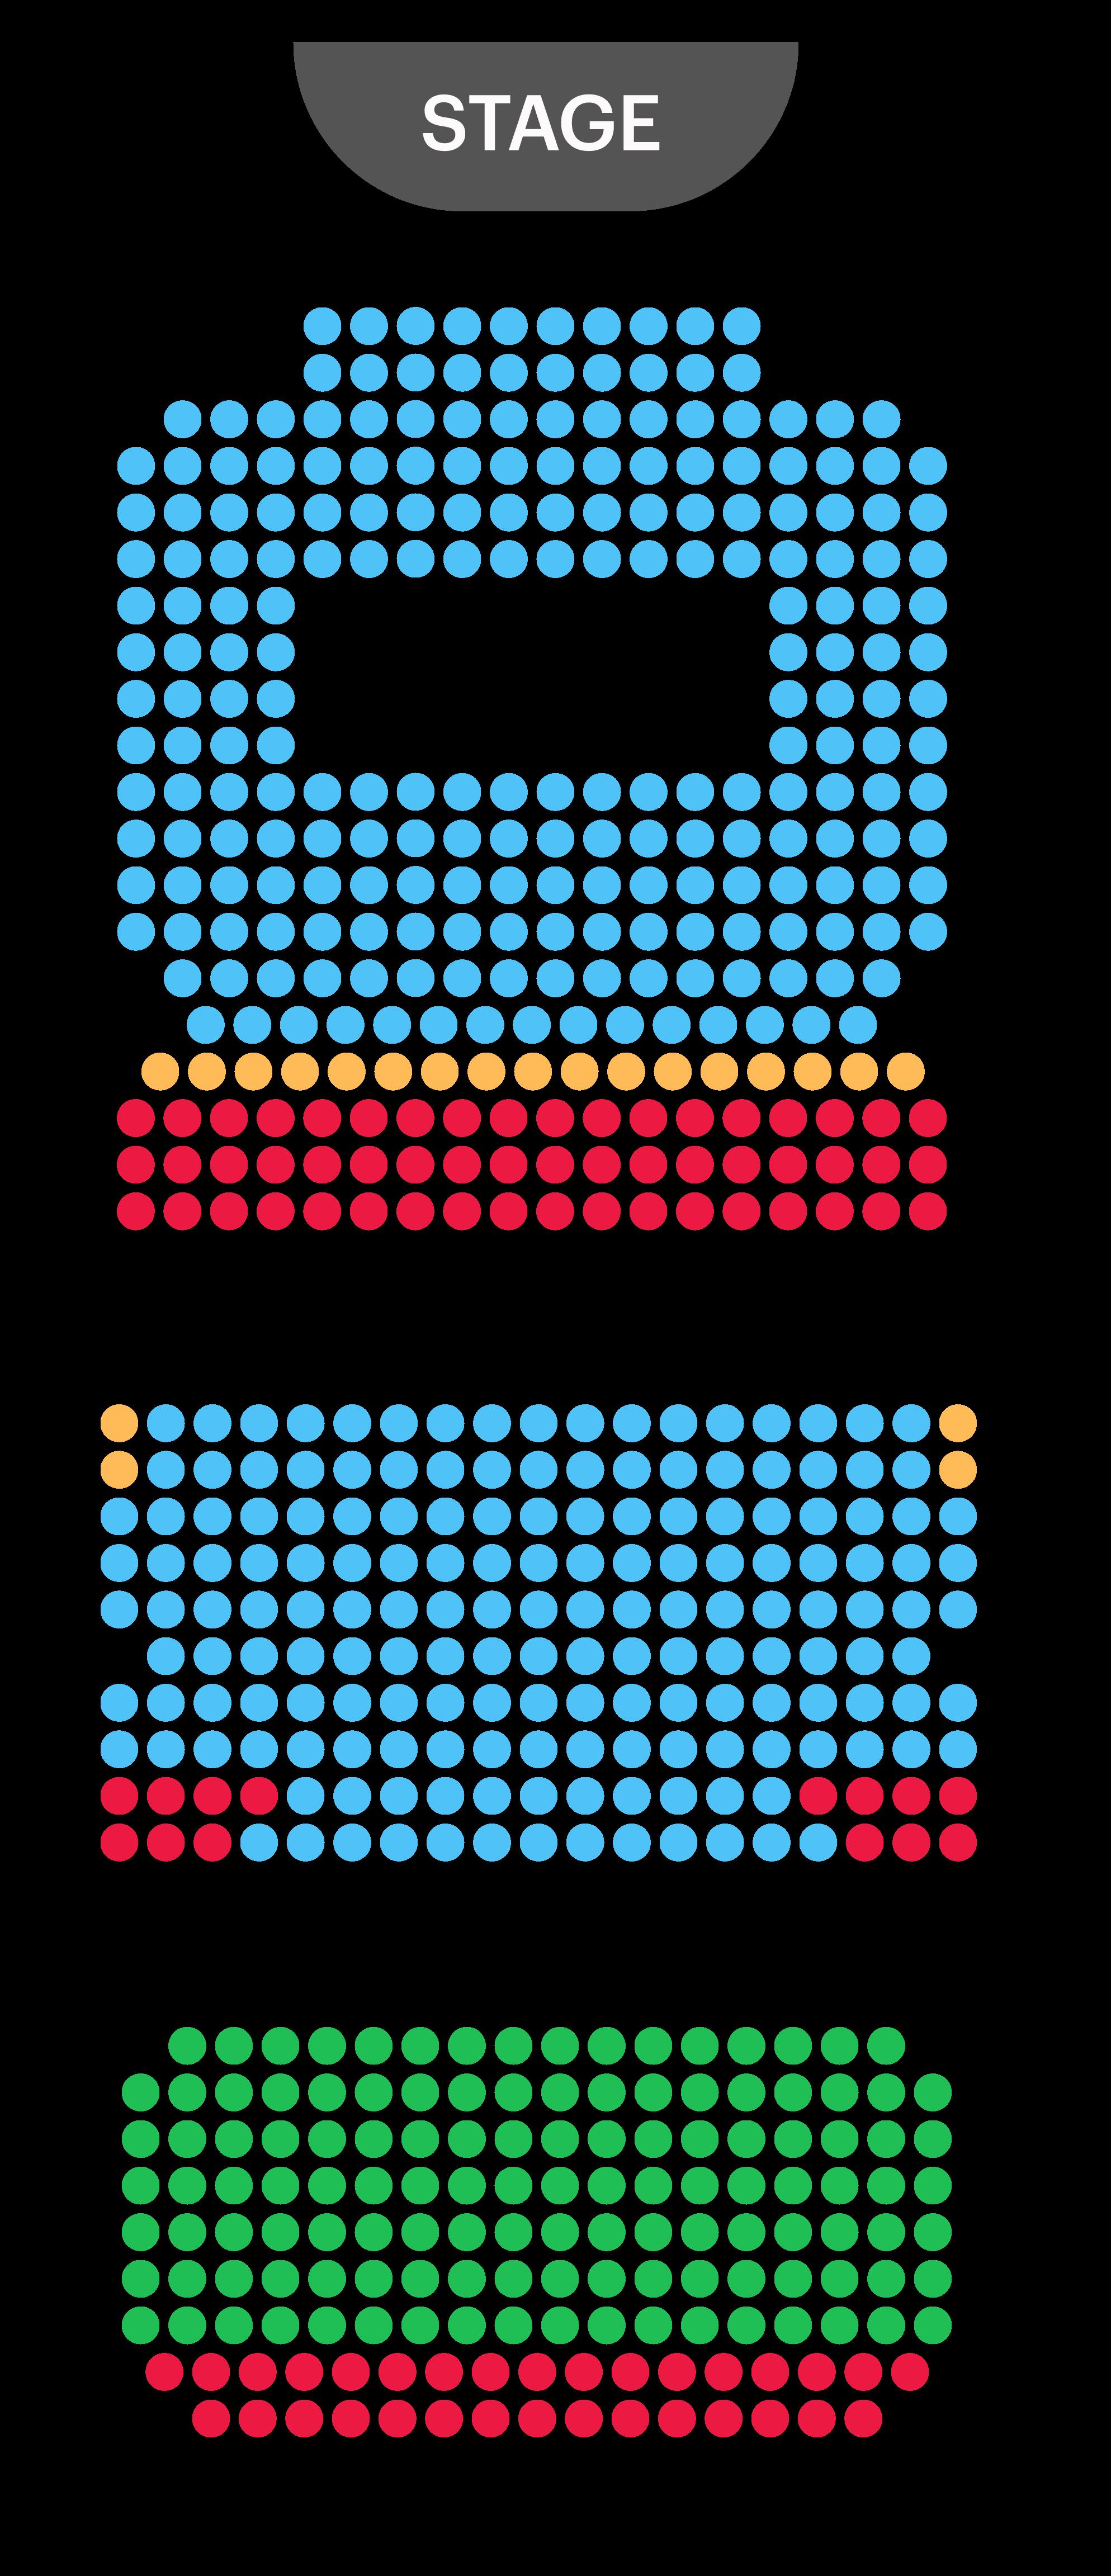 Vaudeville Theatre Seating Map